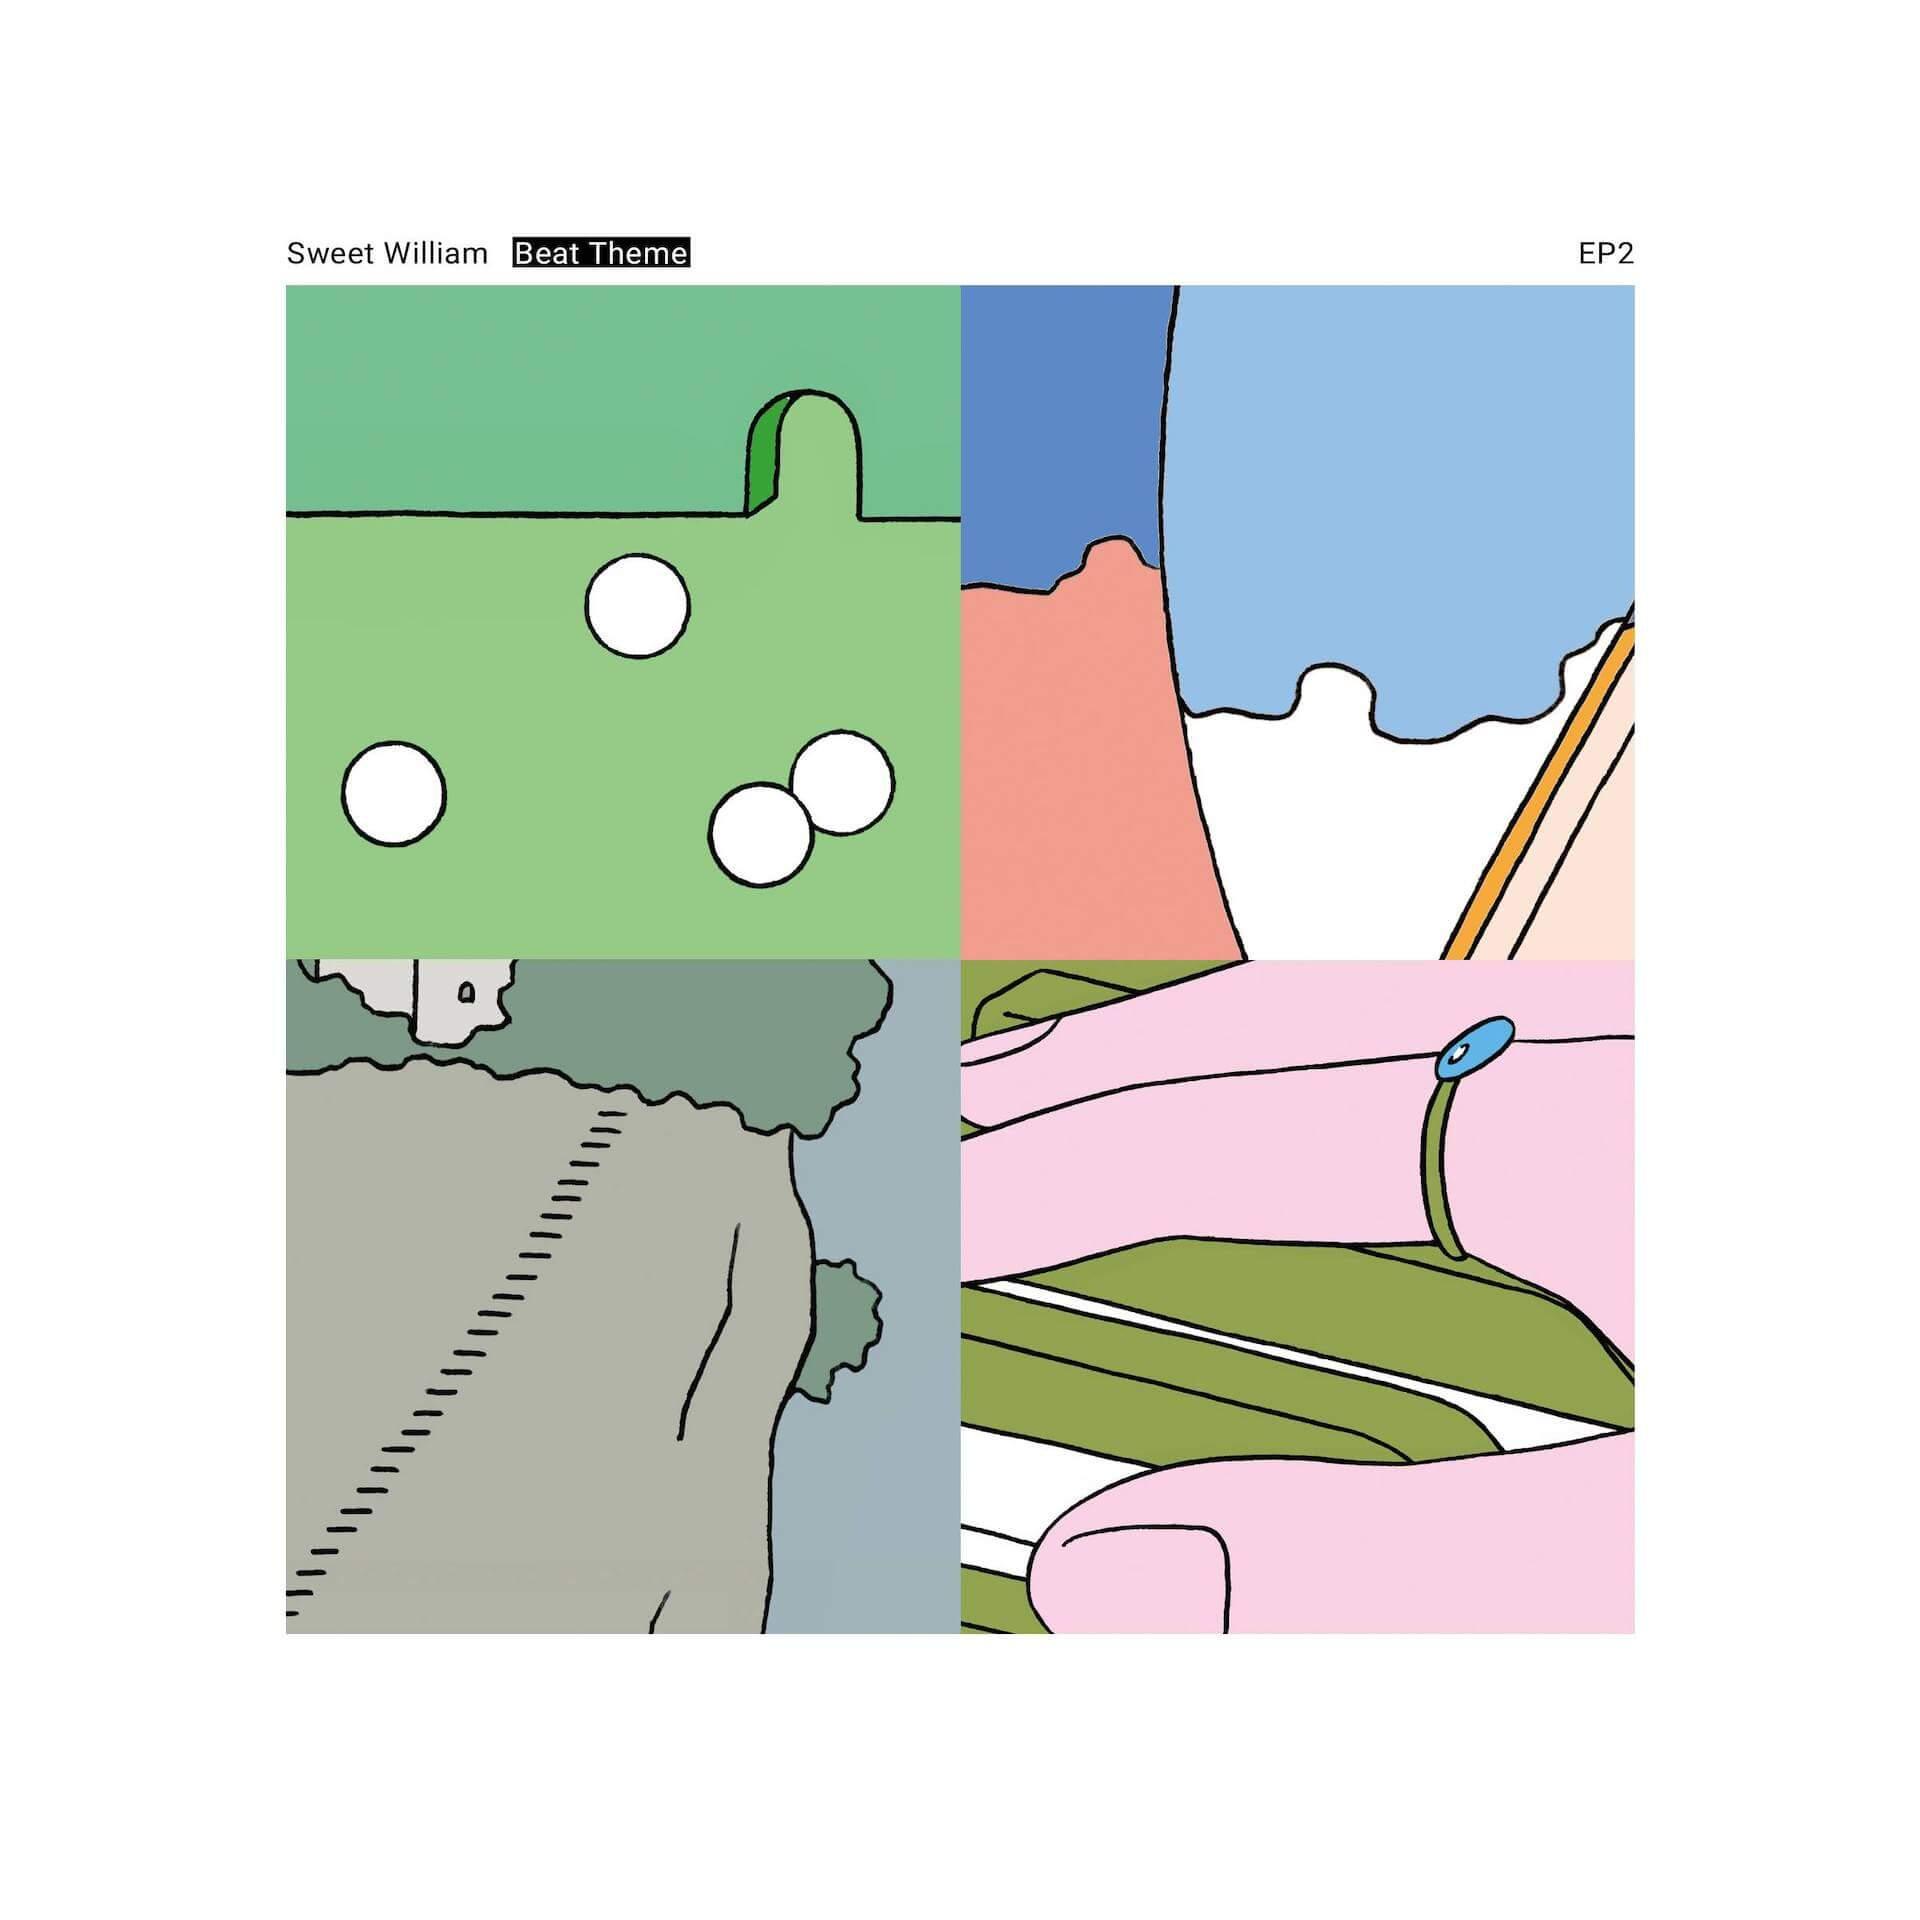 Sweet William新作アルバム『Beat Theme』が本日発売&全曲ループアニメーションも公開! 04-vinyl-jacket-EP2